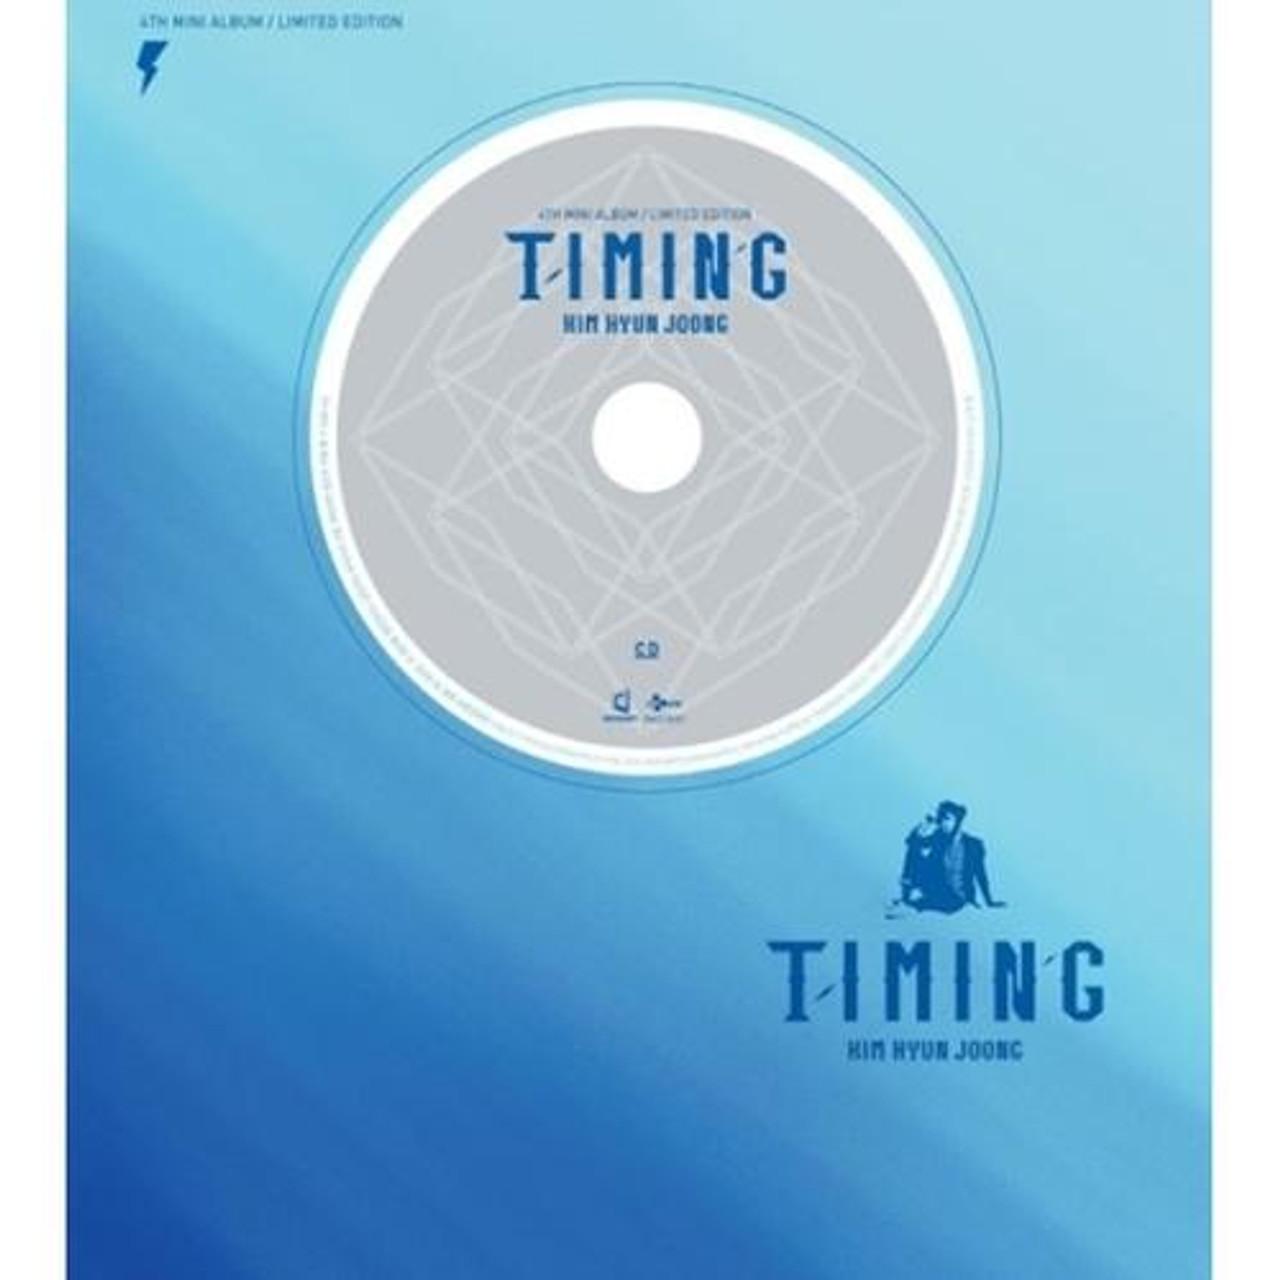 Kim Hyun Joong - 4th Mini Album / Timing (LIMITED EDITION)